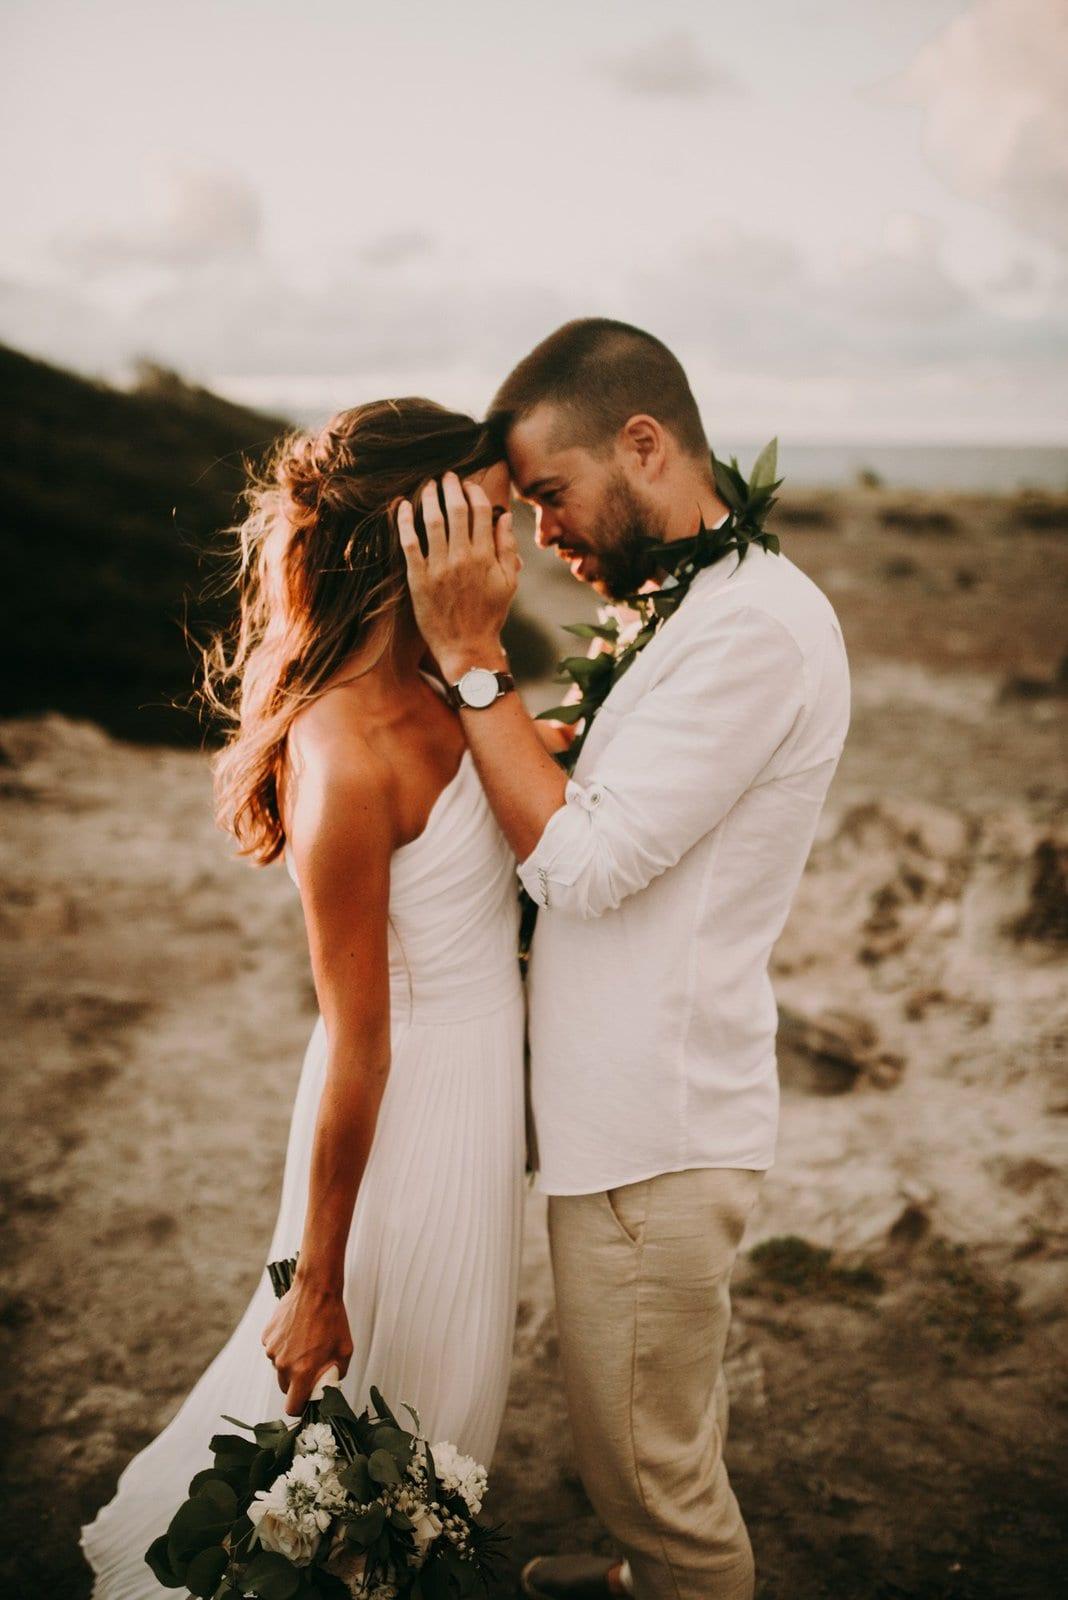 intimate portraits in hawaii